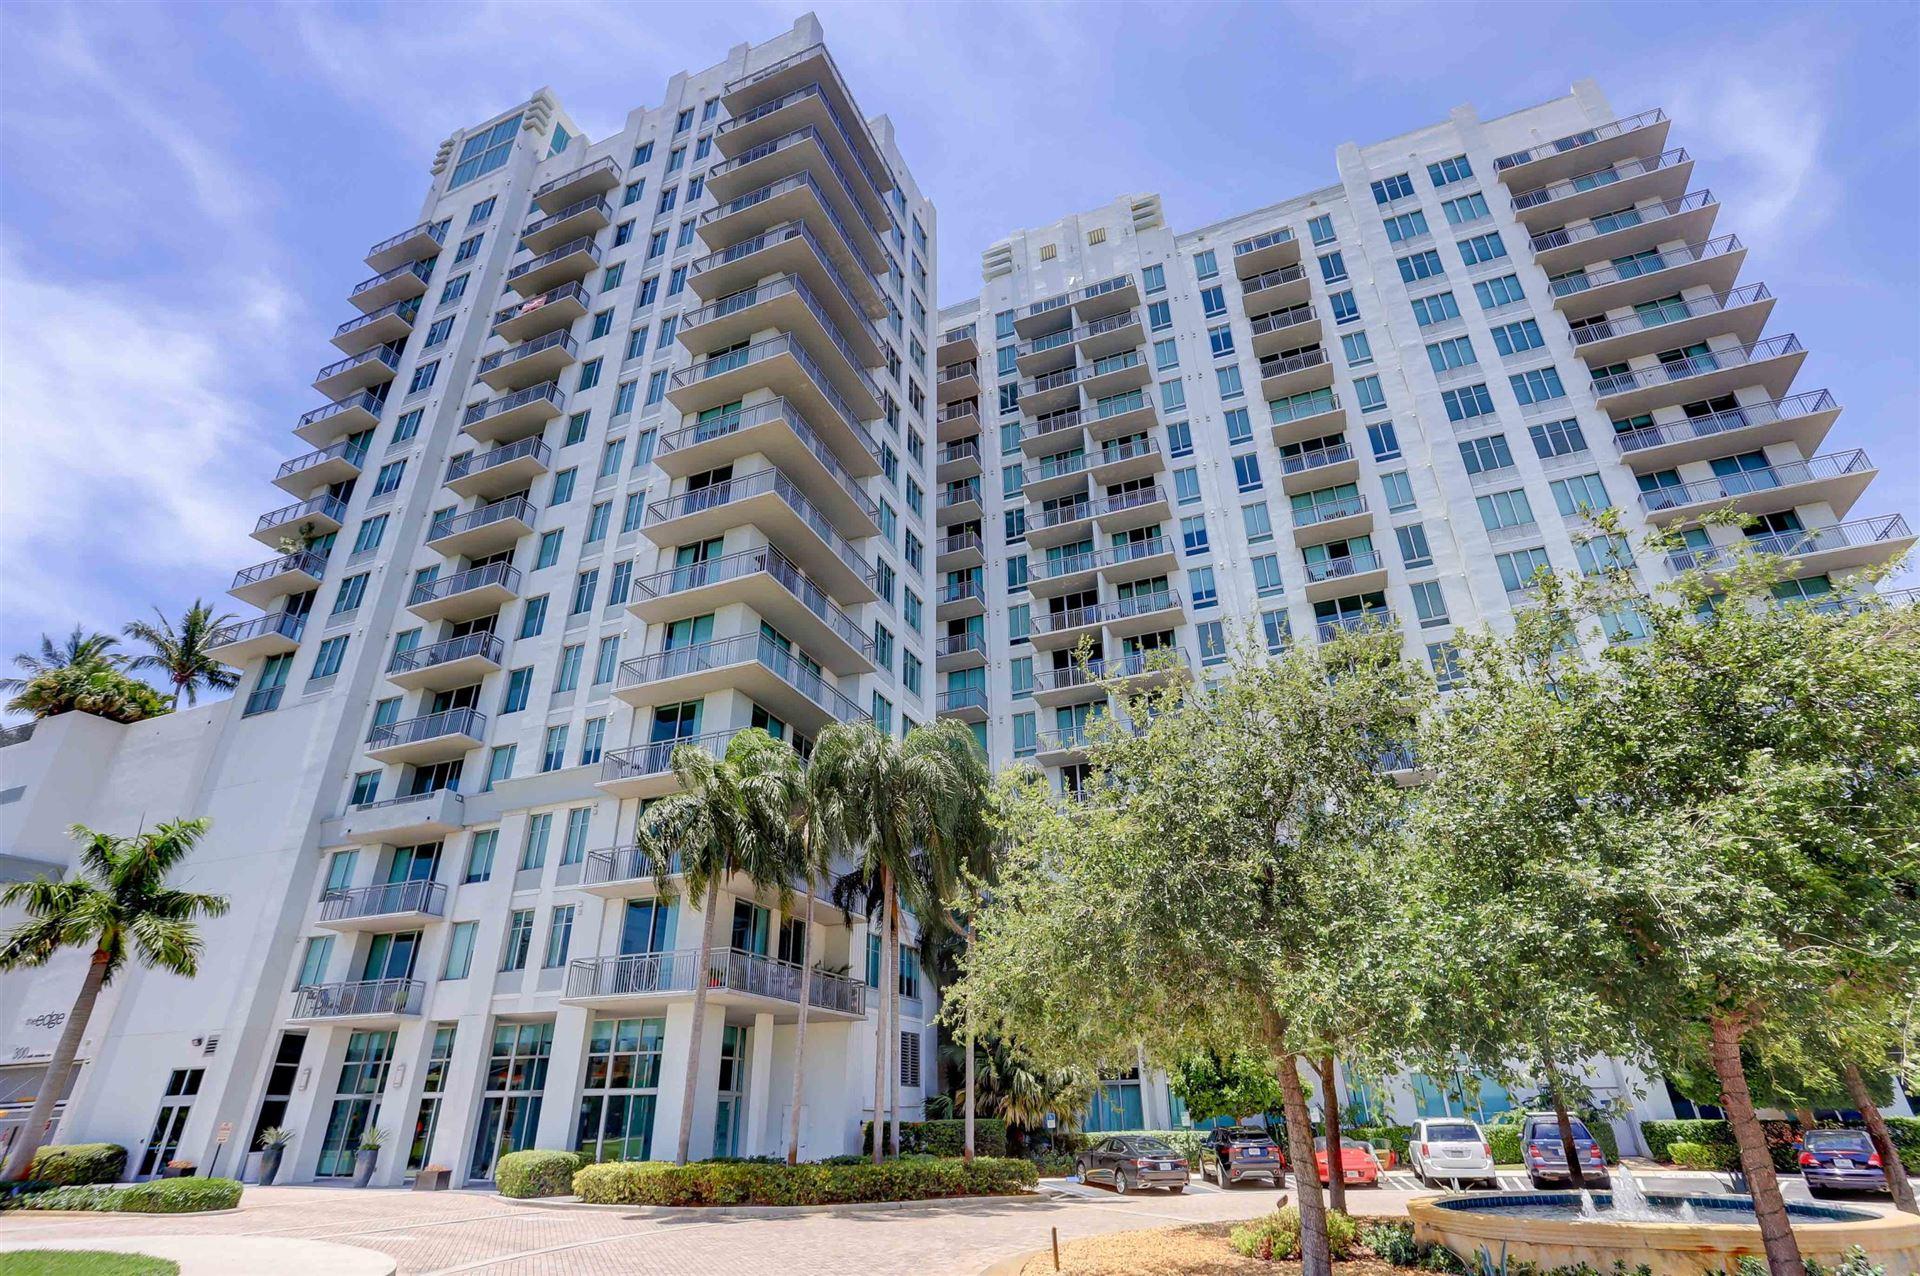 300 S Australian Avenue #812, West Palm Beach, FL 33401 - #: RX-10637640